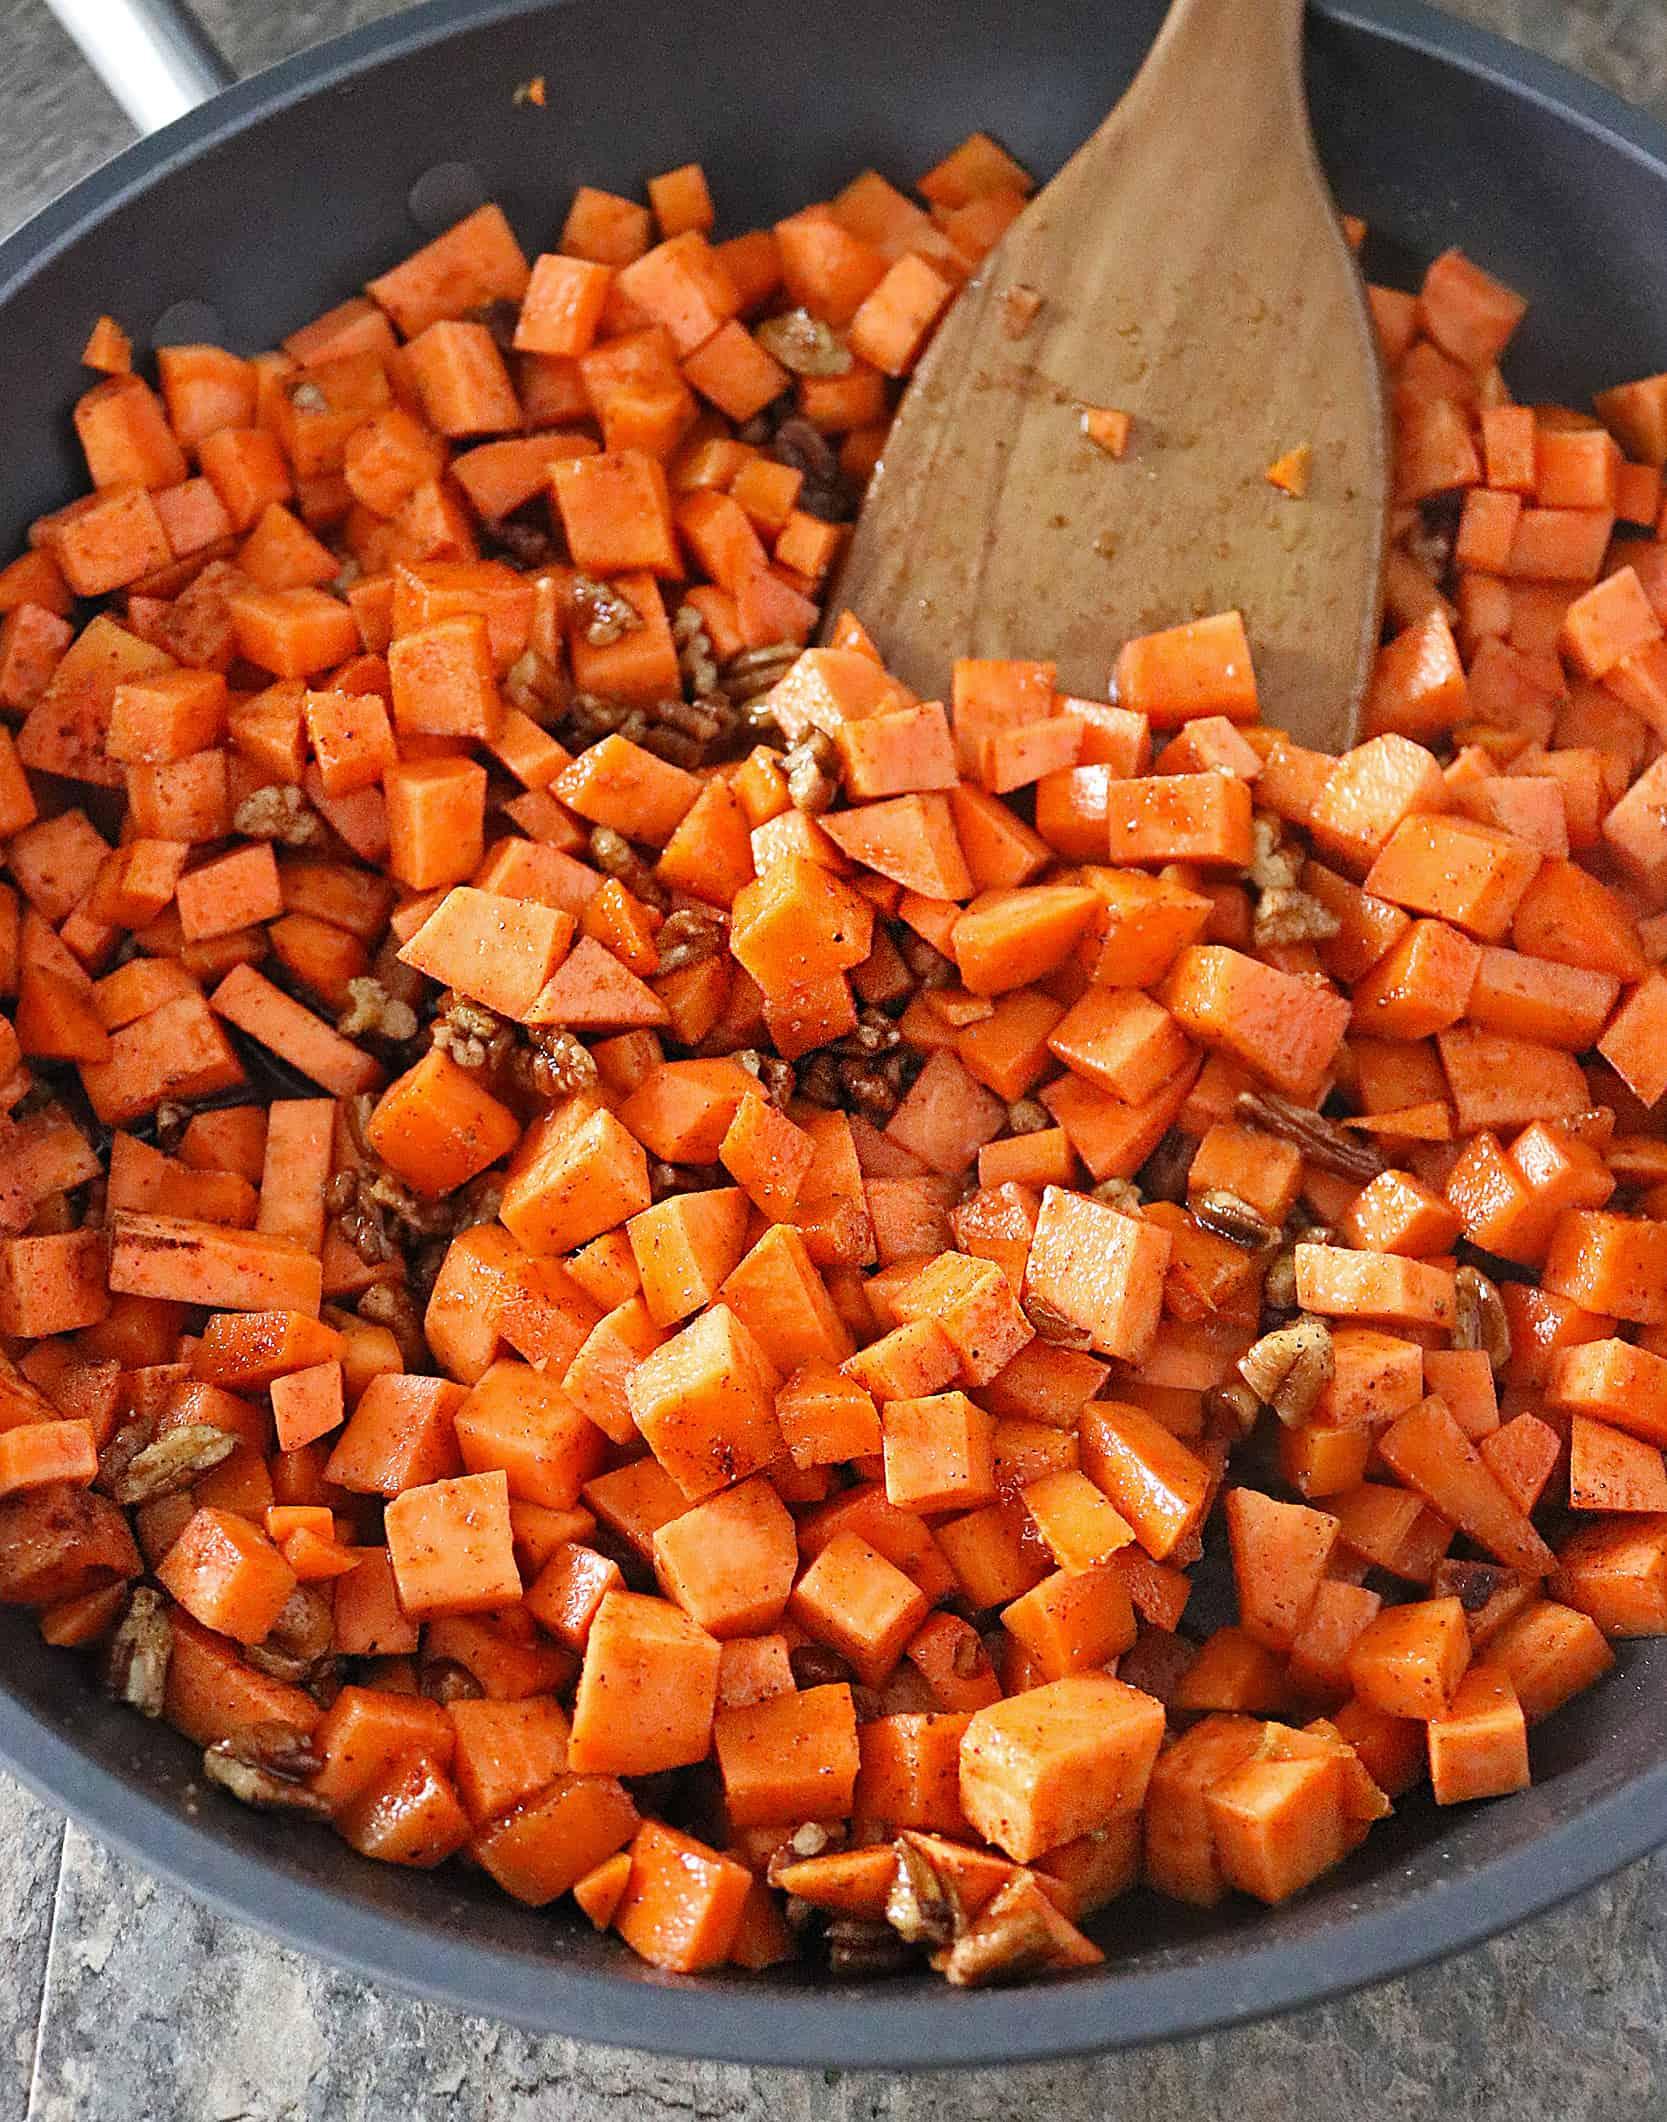 Photo of Sweet Potato Saute In Anolon Skillet